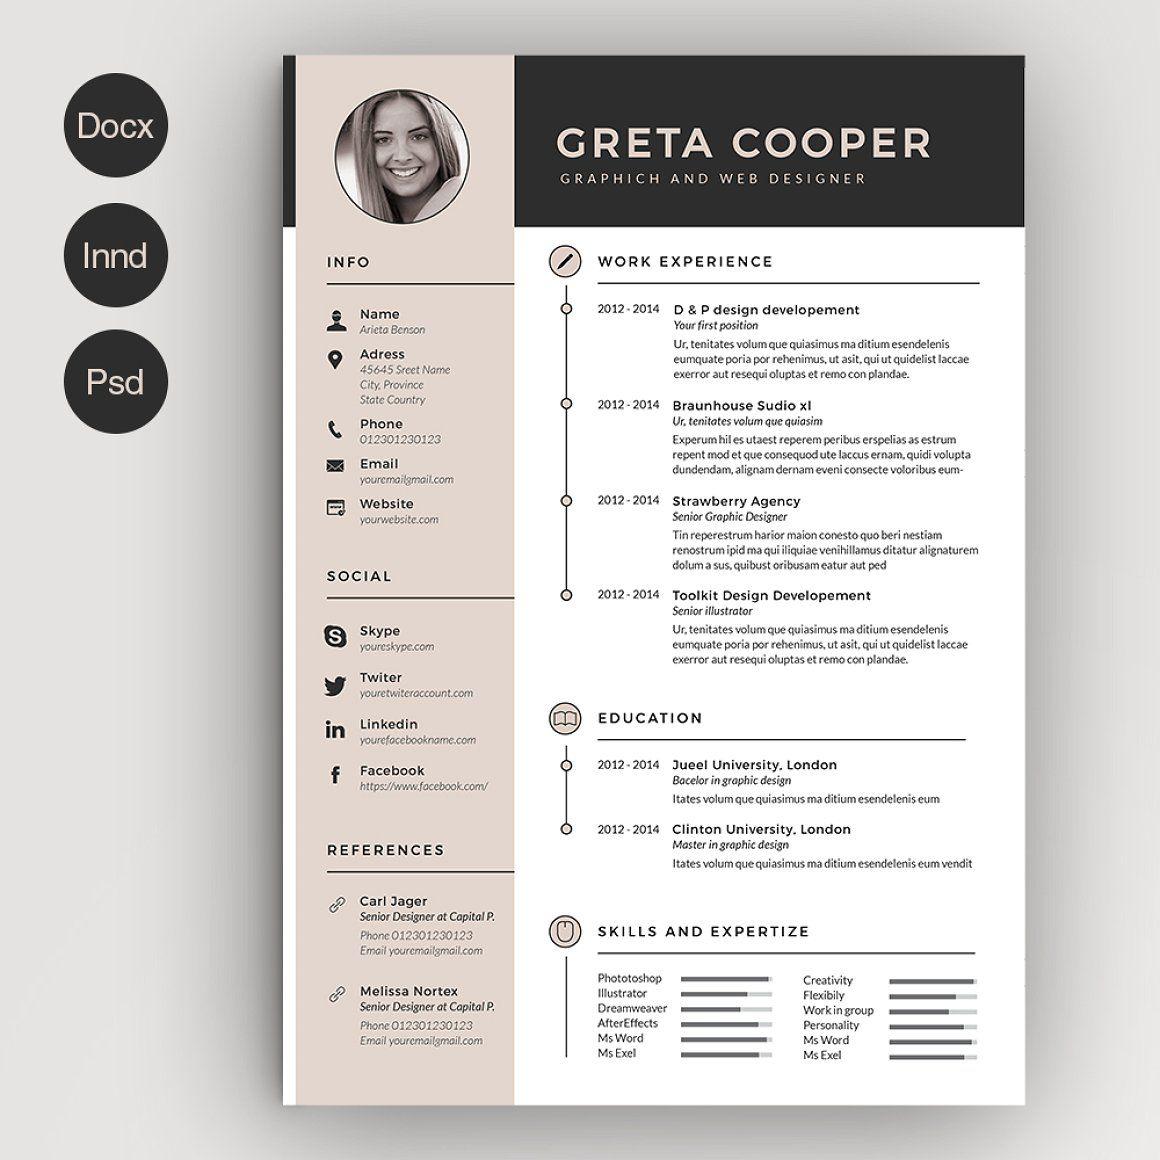 10 Creative Ways To Get Your Resume Noticed Modele Cv Modele De Cv Creatif Cv Moderne